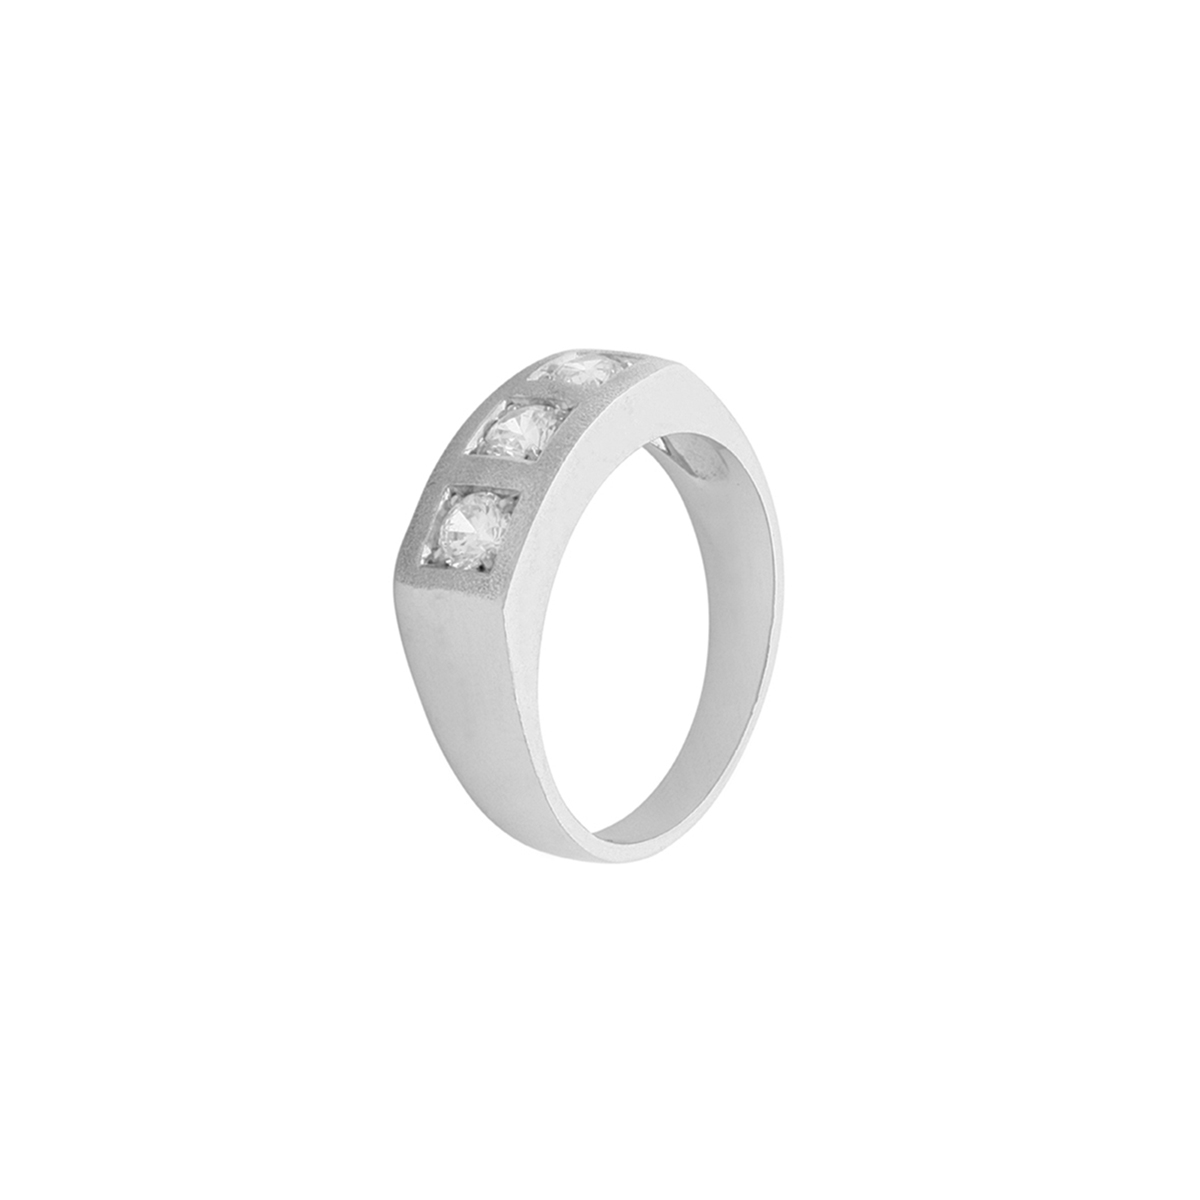 Squared Trilogy Ring in Platinum